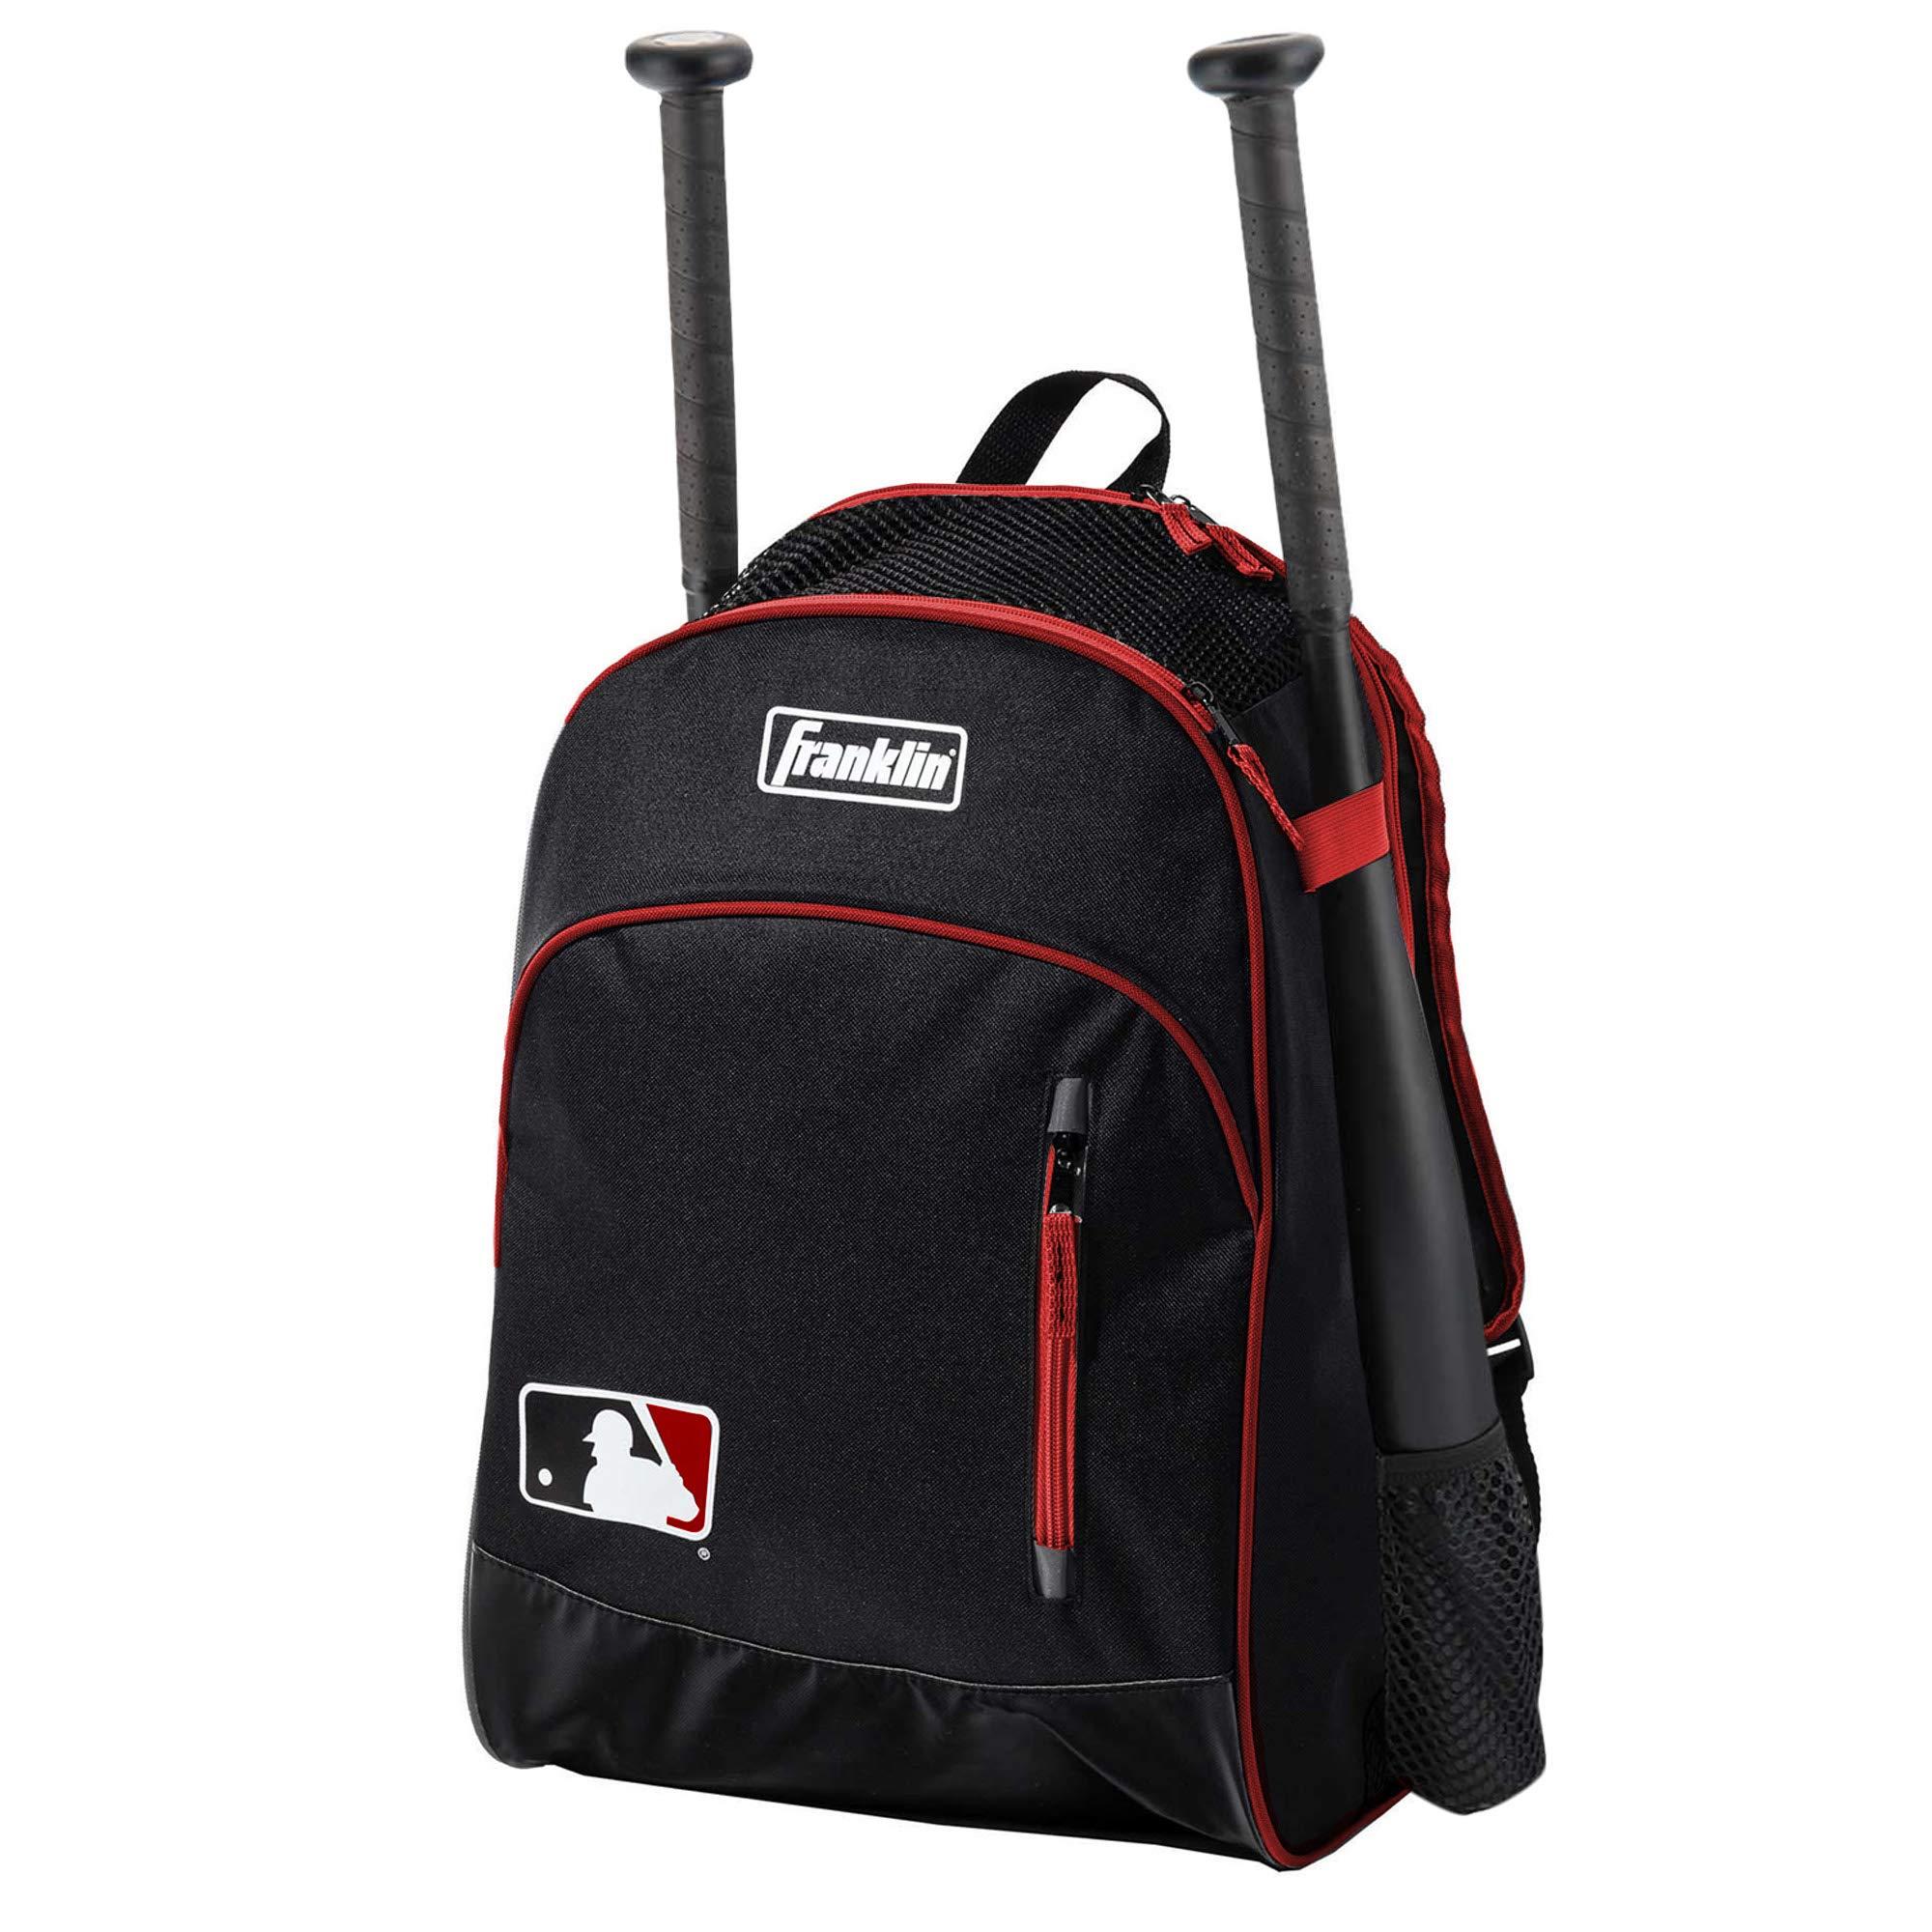 Franklin Sports MLB Batpack Bag - Perfect for Baseball, Softball, & T-Ball - Black/Red